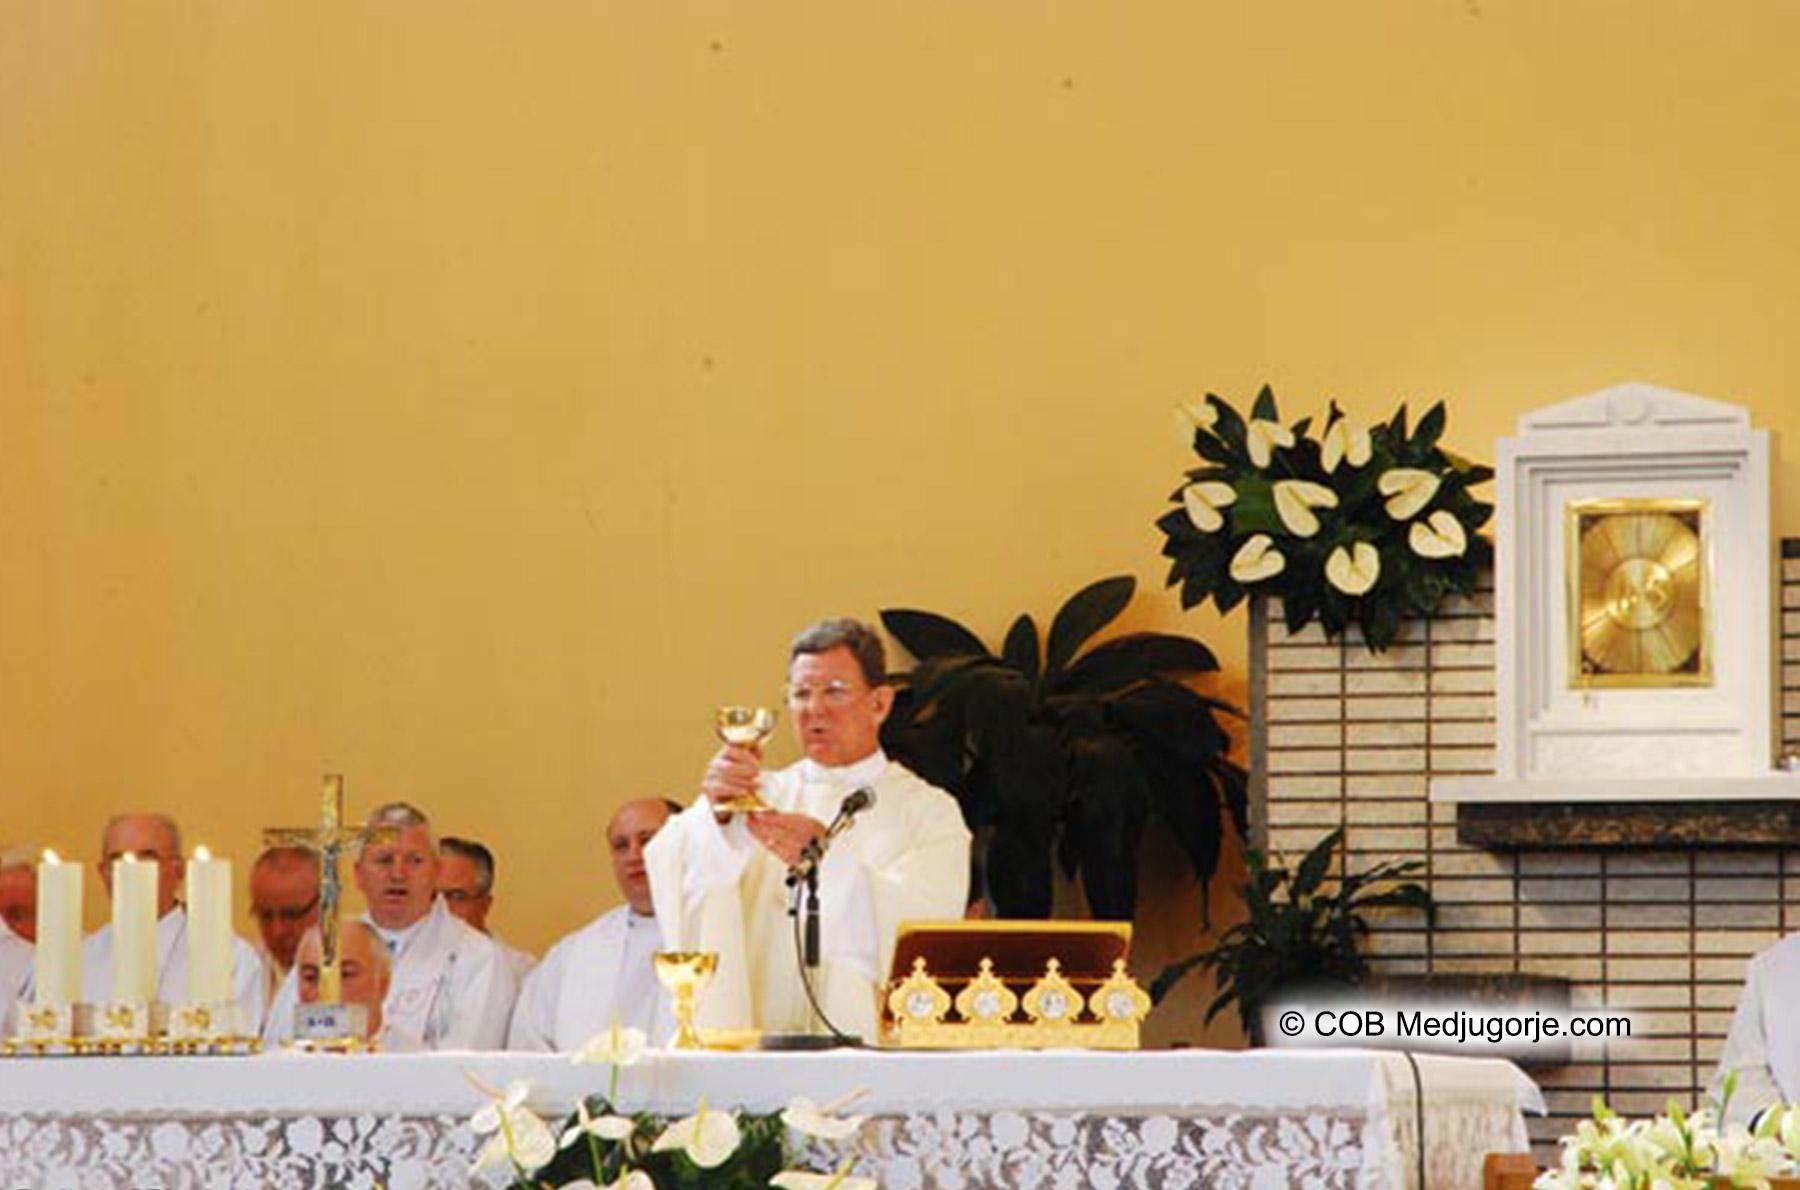 Fr. Frank Perry